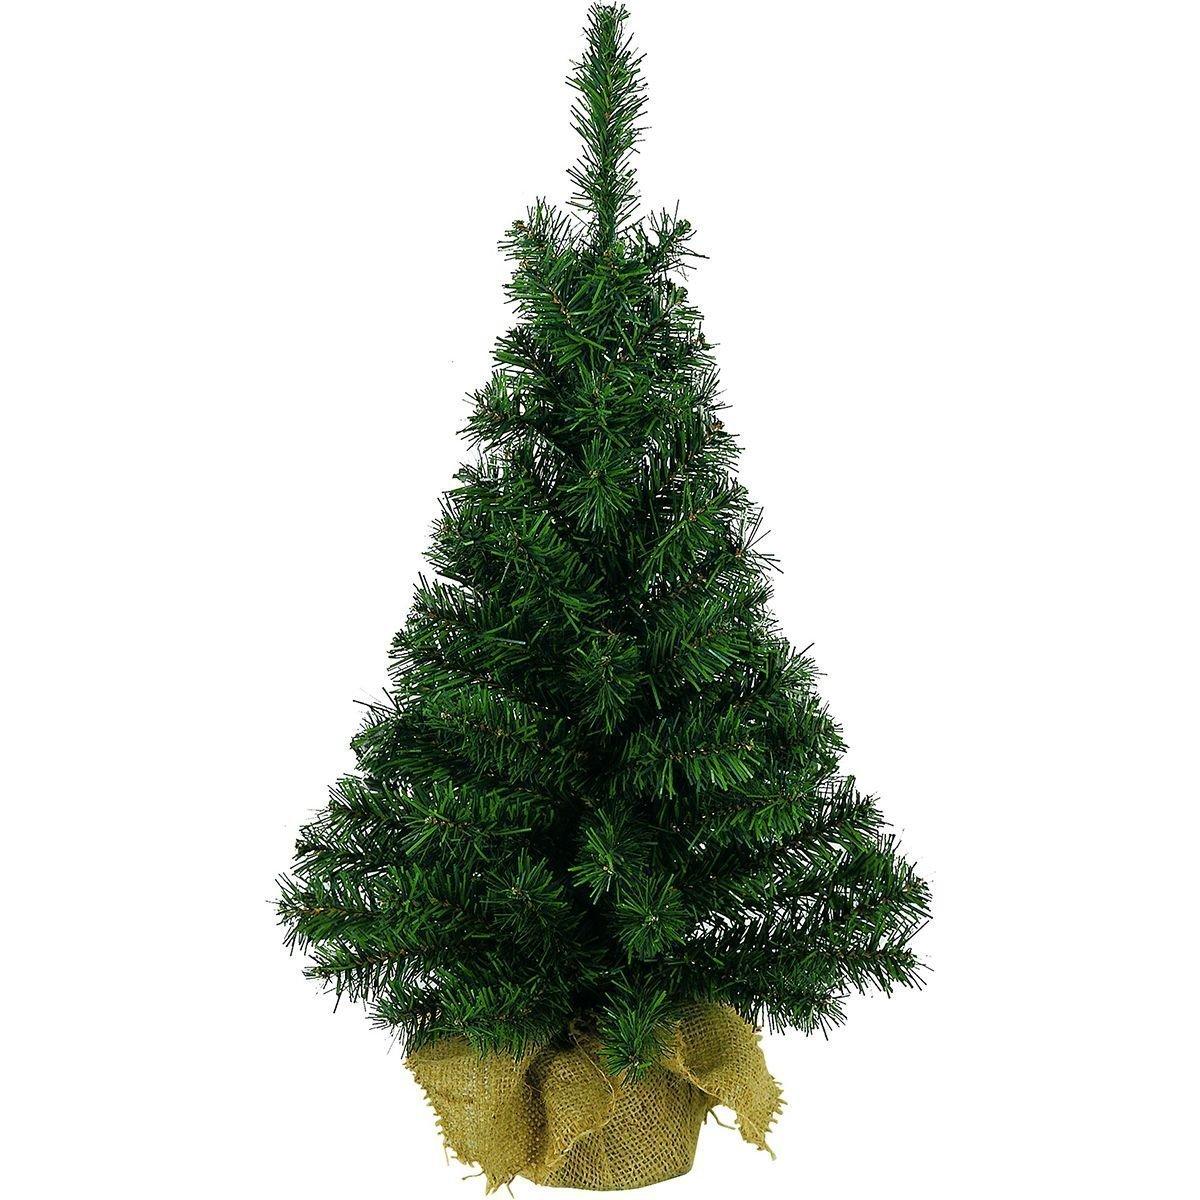 Artificial Green Tree In Jute Bag - 45cm Fizzco